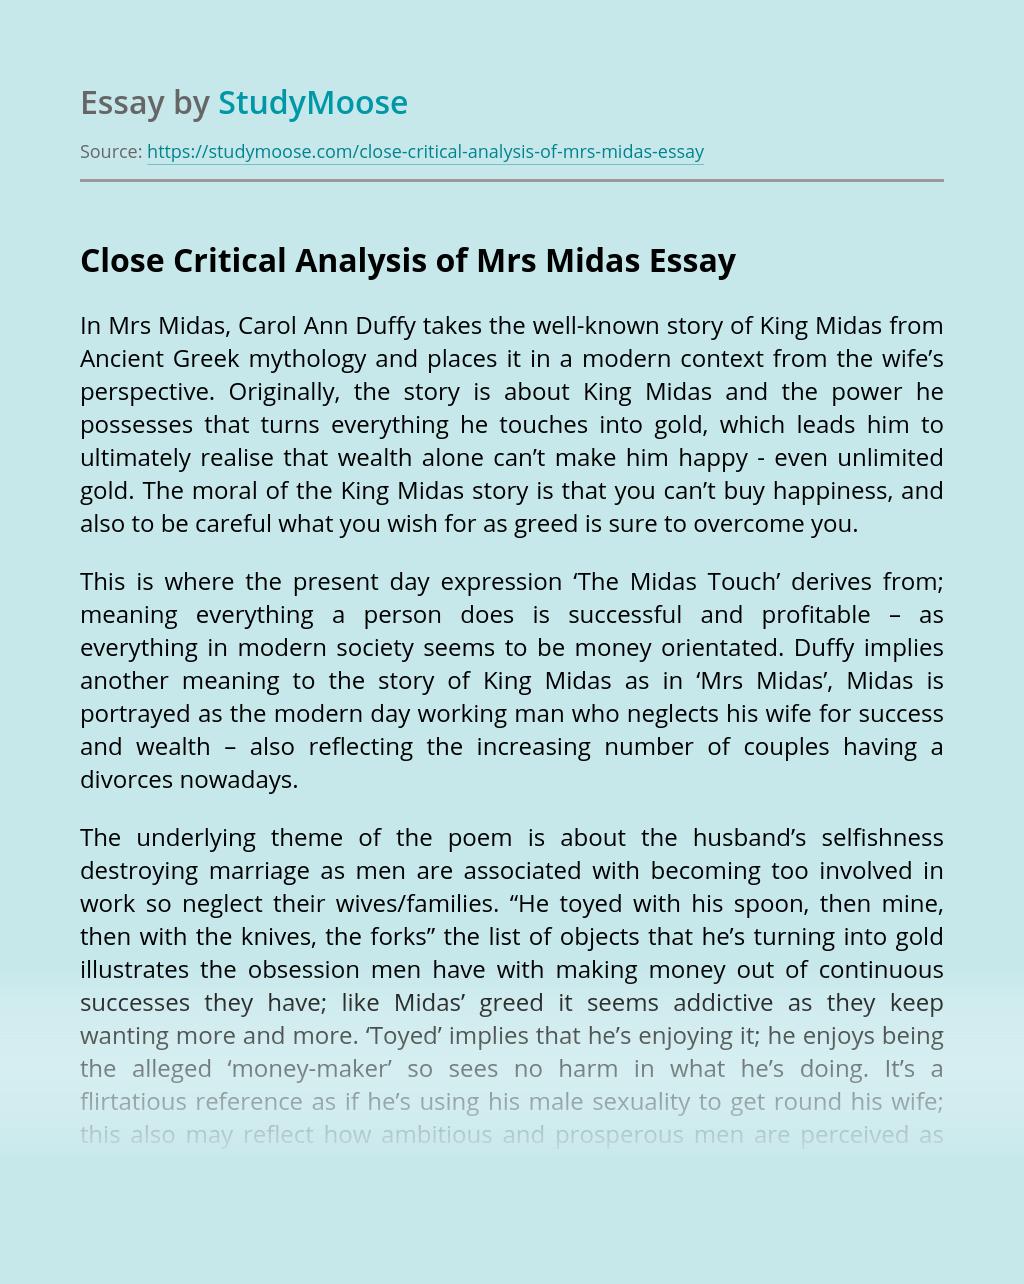 Close Critical Analysis of Mrs Midas